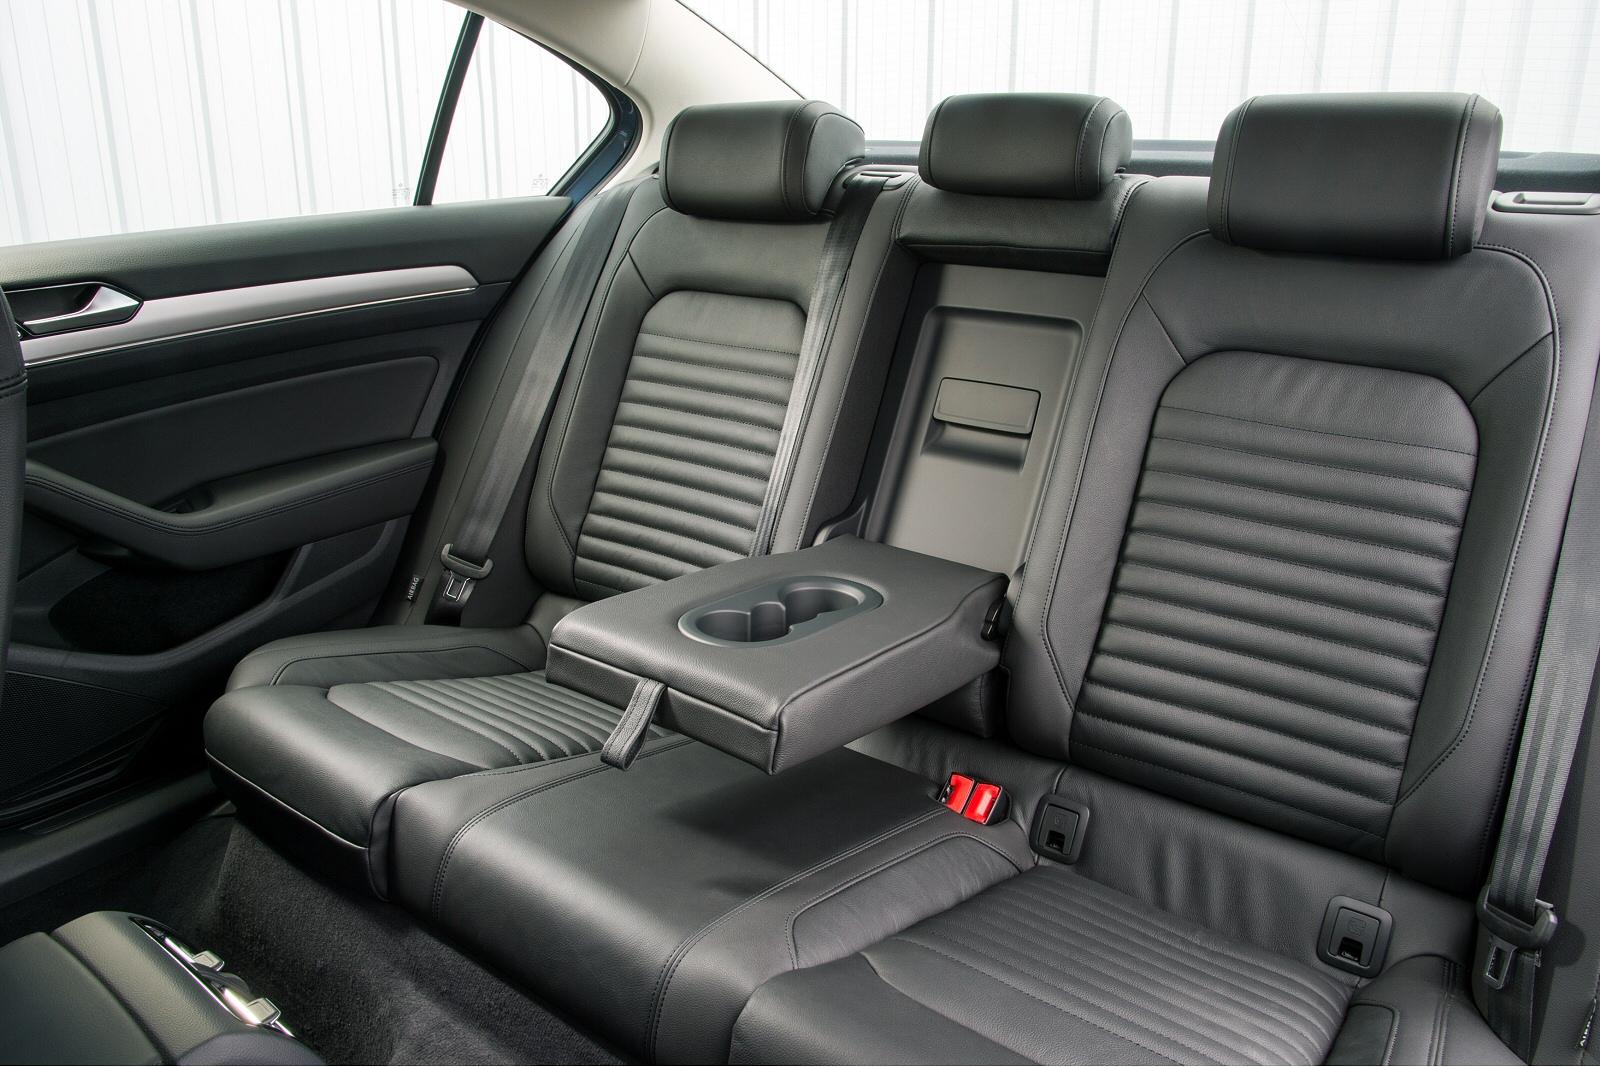 New Volkswagen Passat 2 0 Tdi R Line 4dr Panoramic Roof